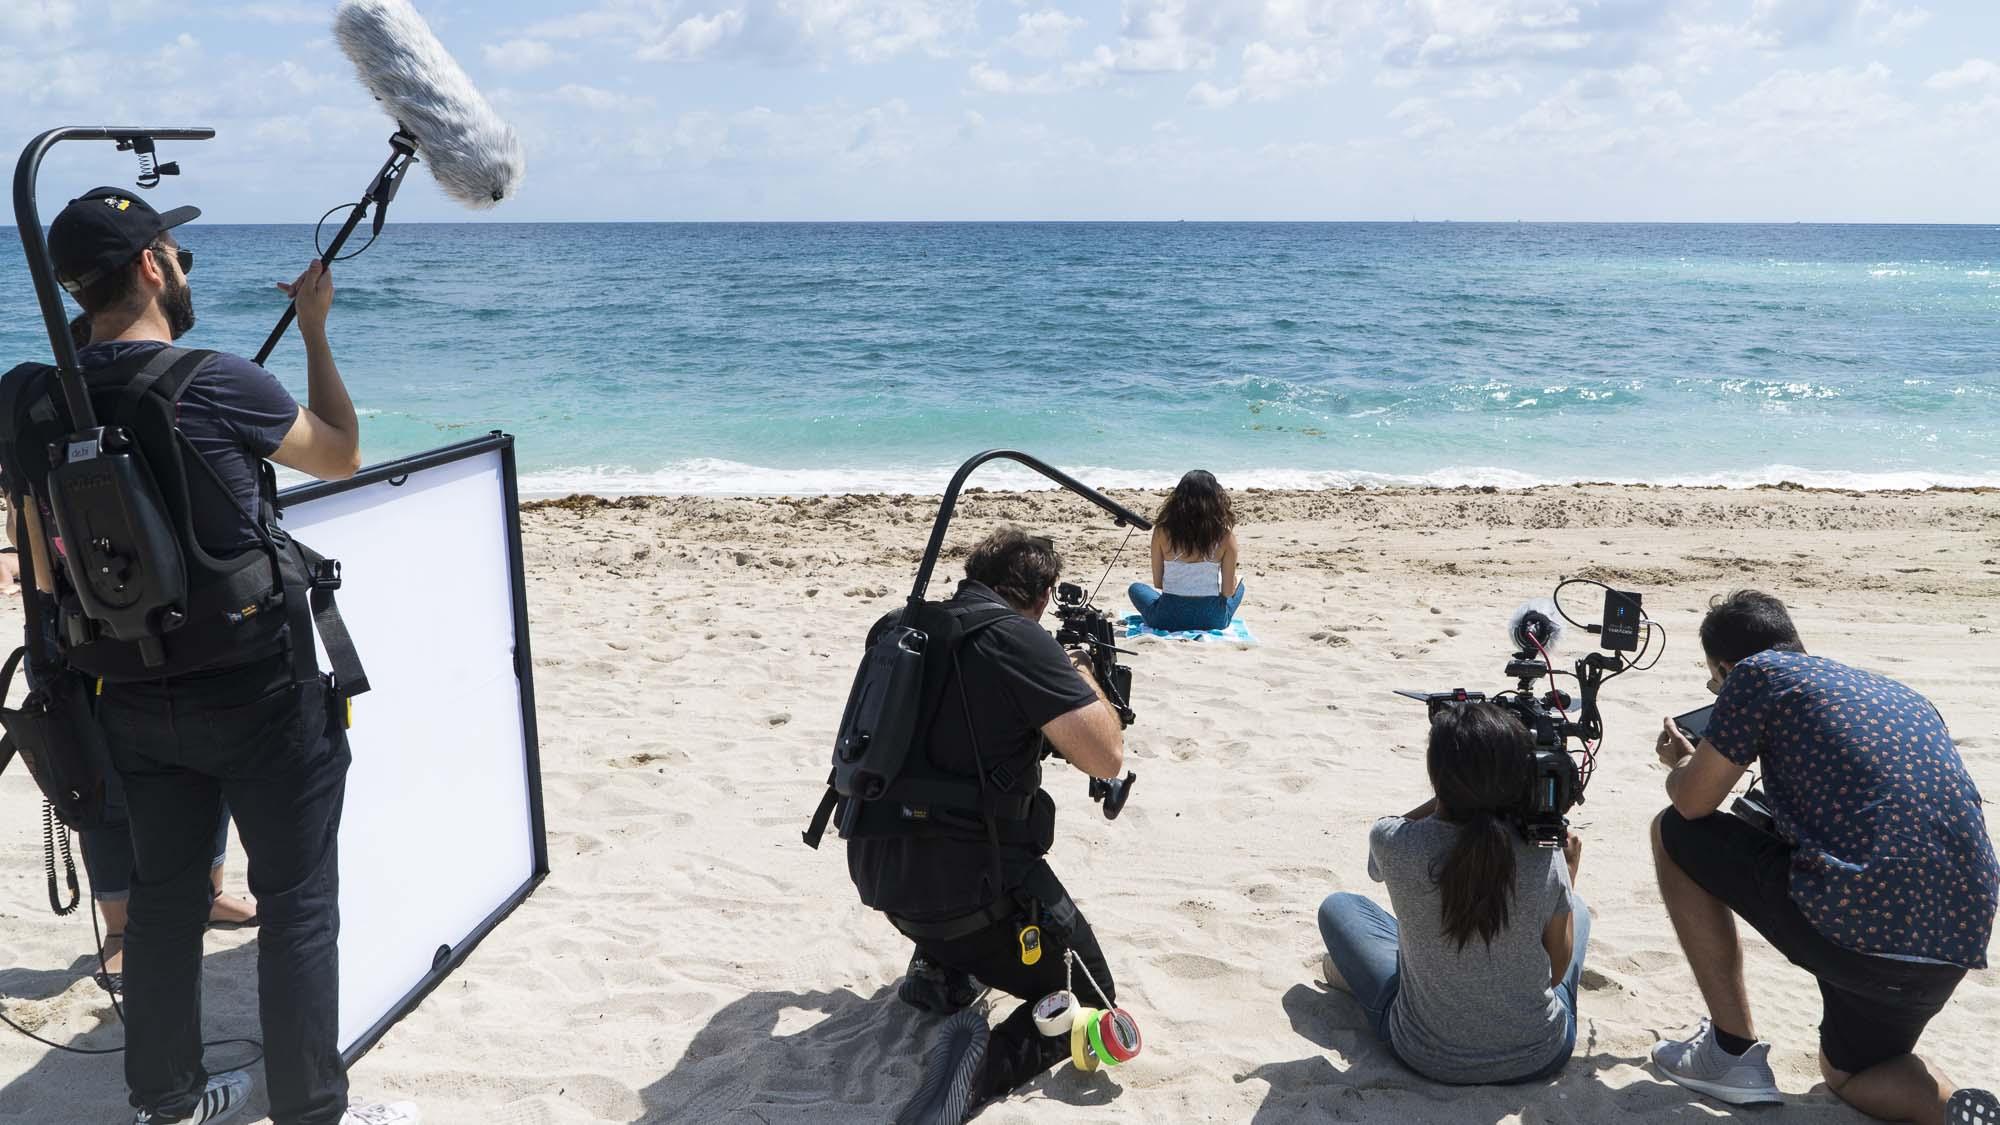 GK_Carnivorous-Shooting-on-the-Beach-16x9-H.jpg